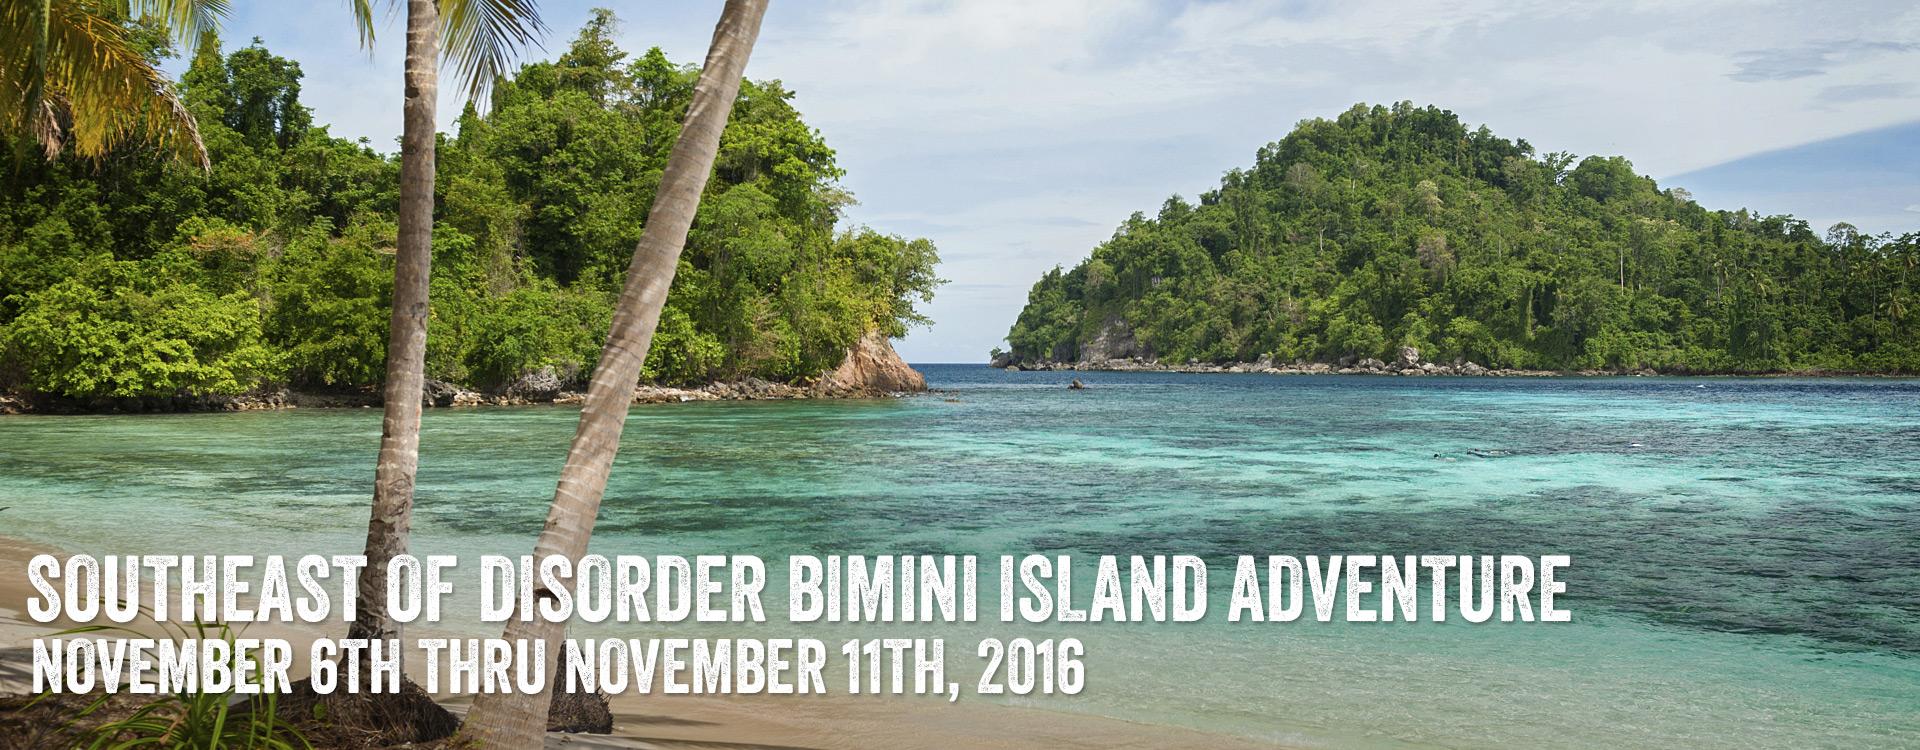 Southeast of Disorder Bimini Island Adventure